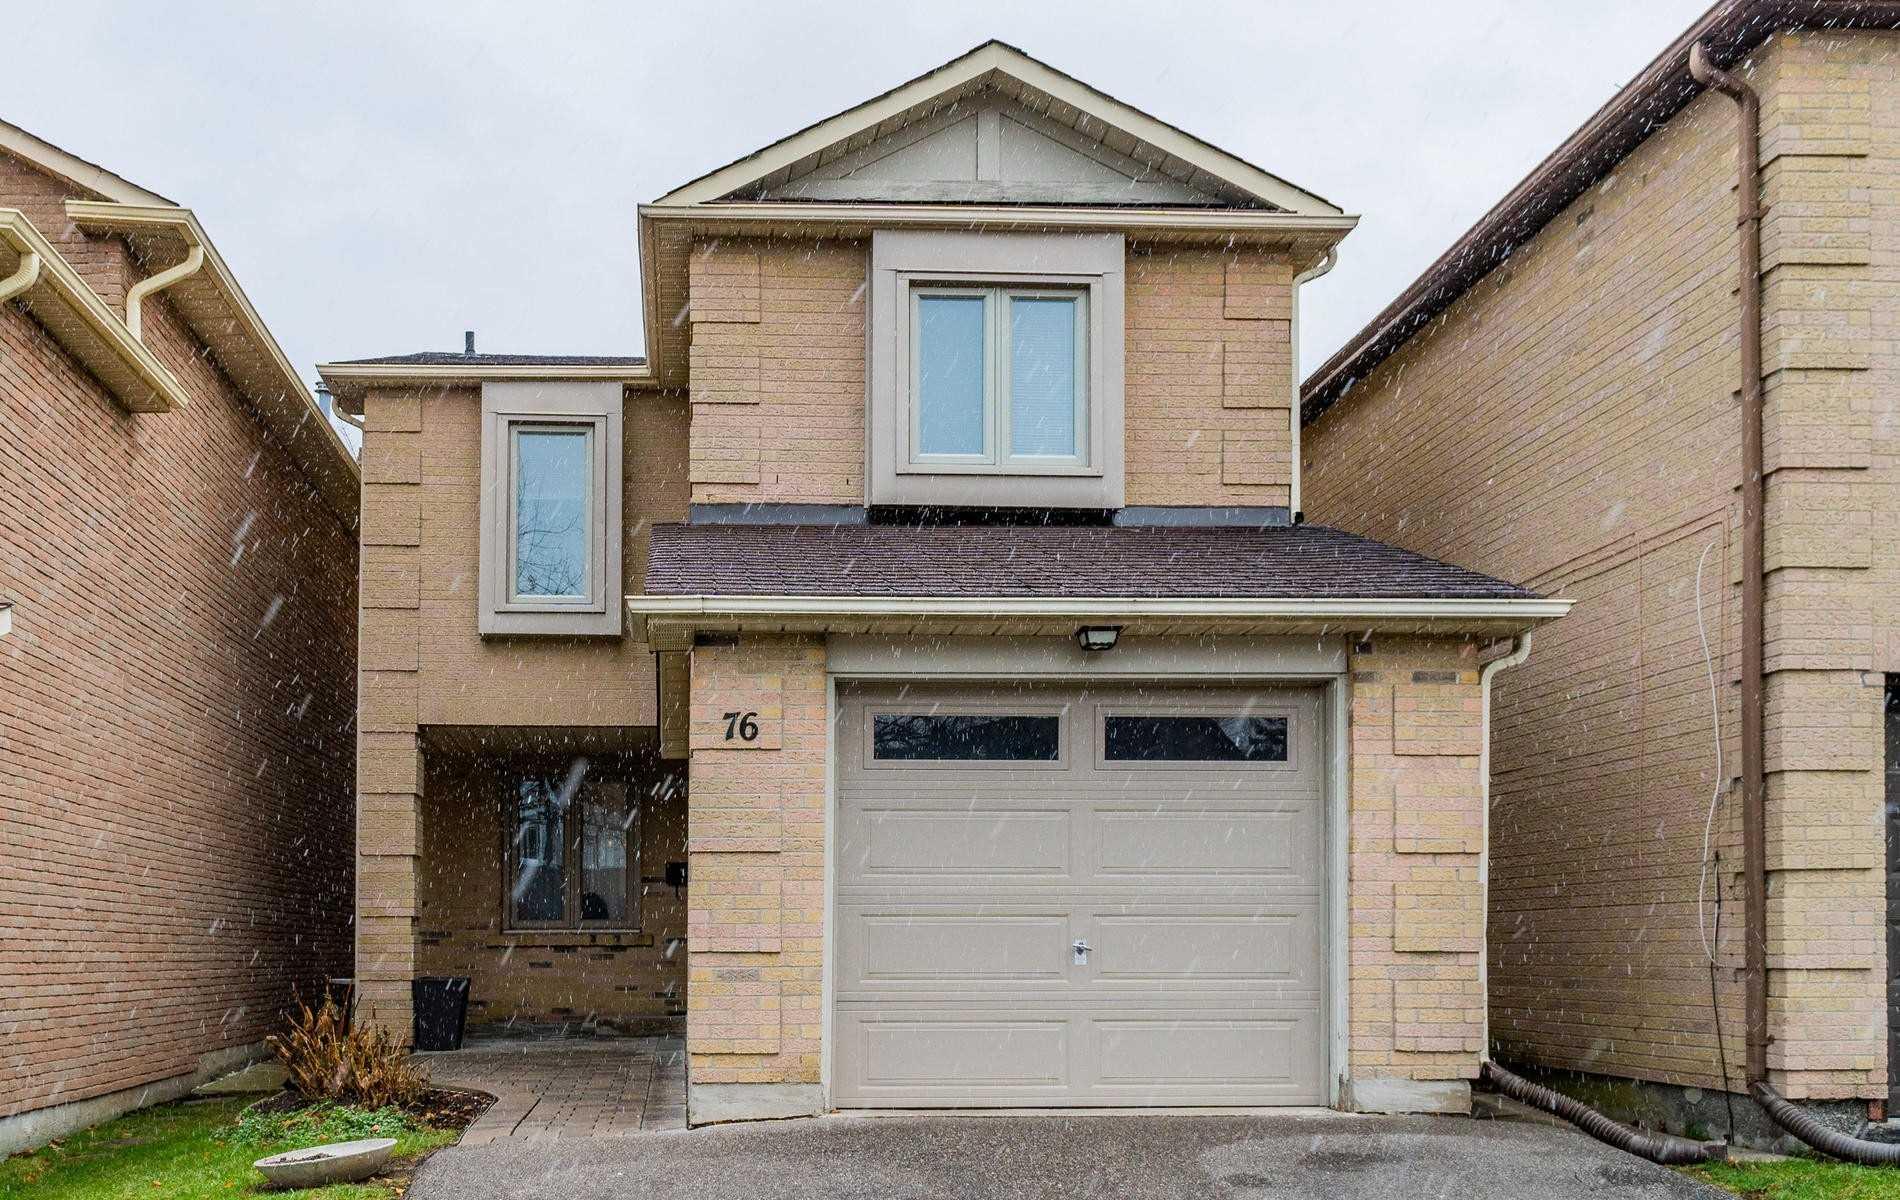 House for sale at 76 Mcmorran Crescent Vaughan Ontario - MLS: N4316762